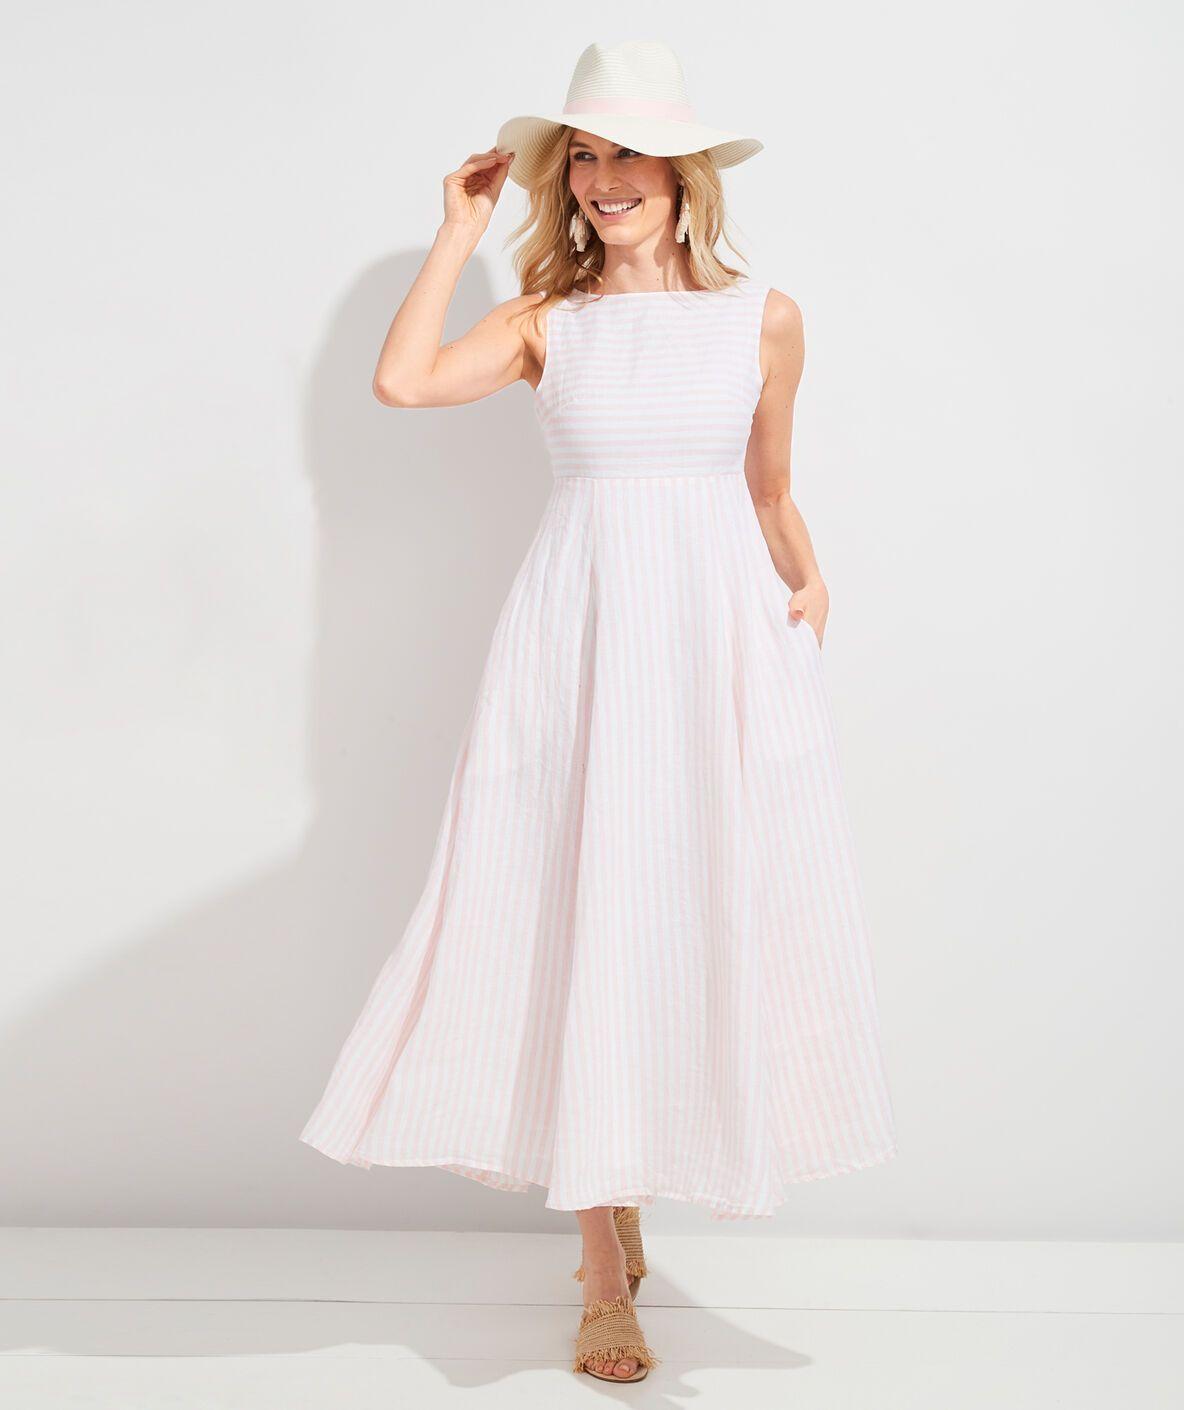 Shop Palm Beach Lately Stripe Maxi Dress At Vineyard Vines Striped Maxi Dresses Dresses Shopping Womens Dresses [ 1410 x 1184 Pixel ]